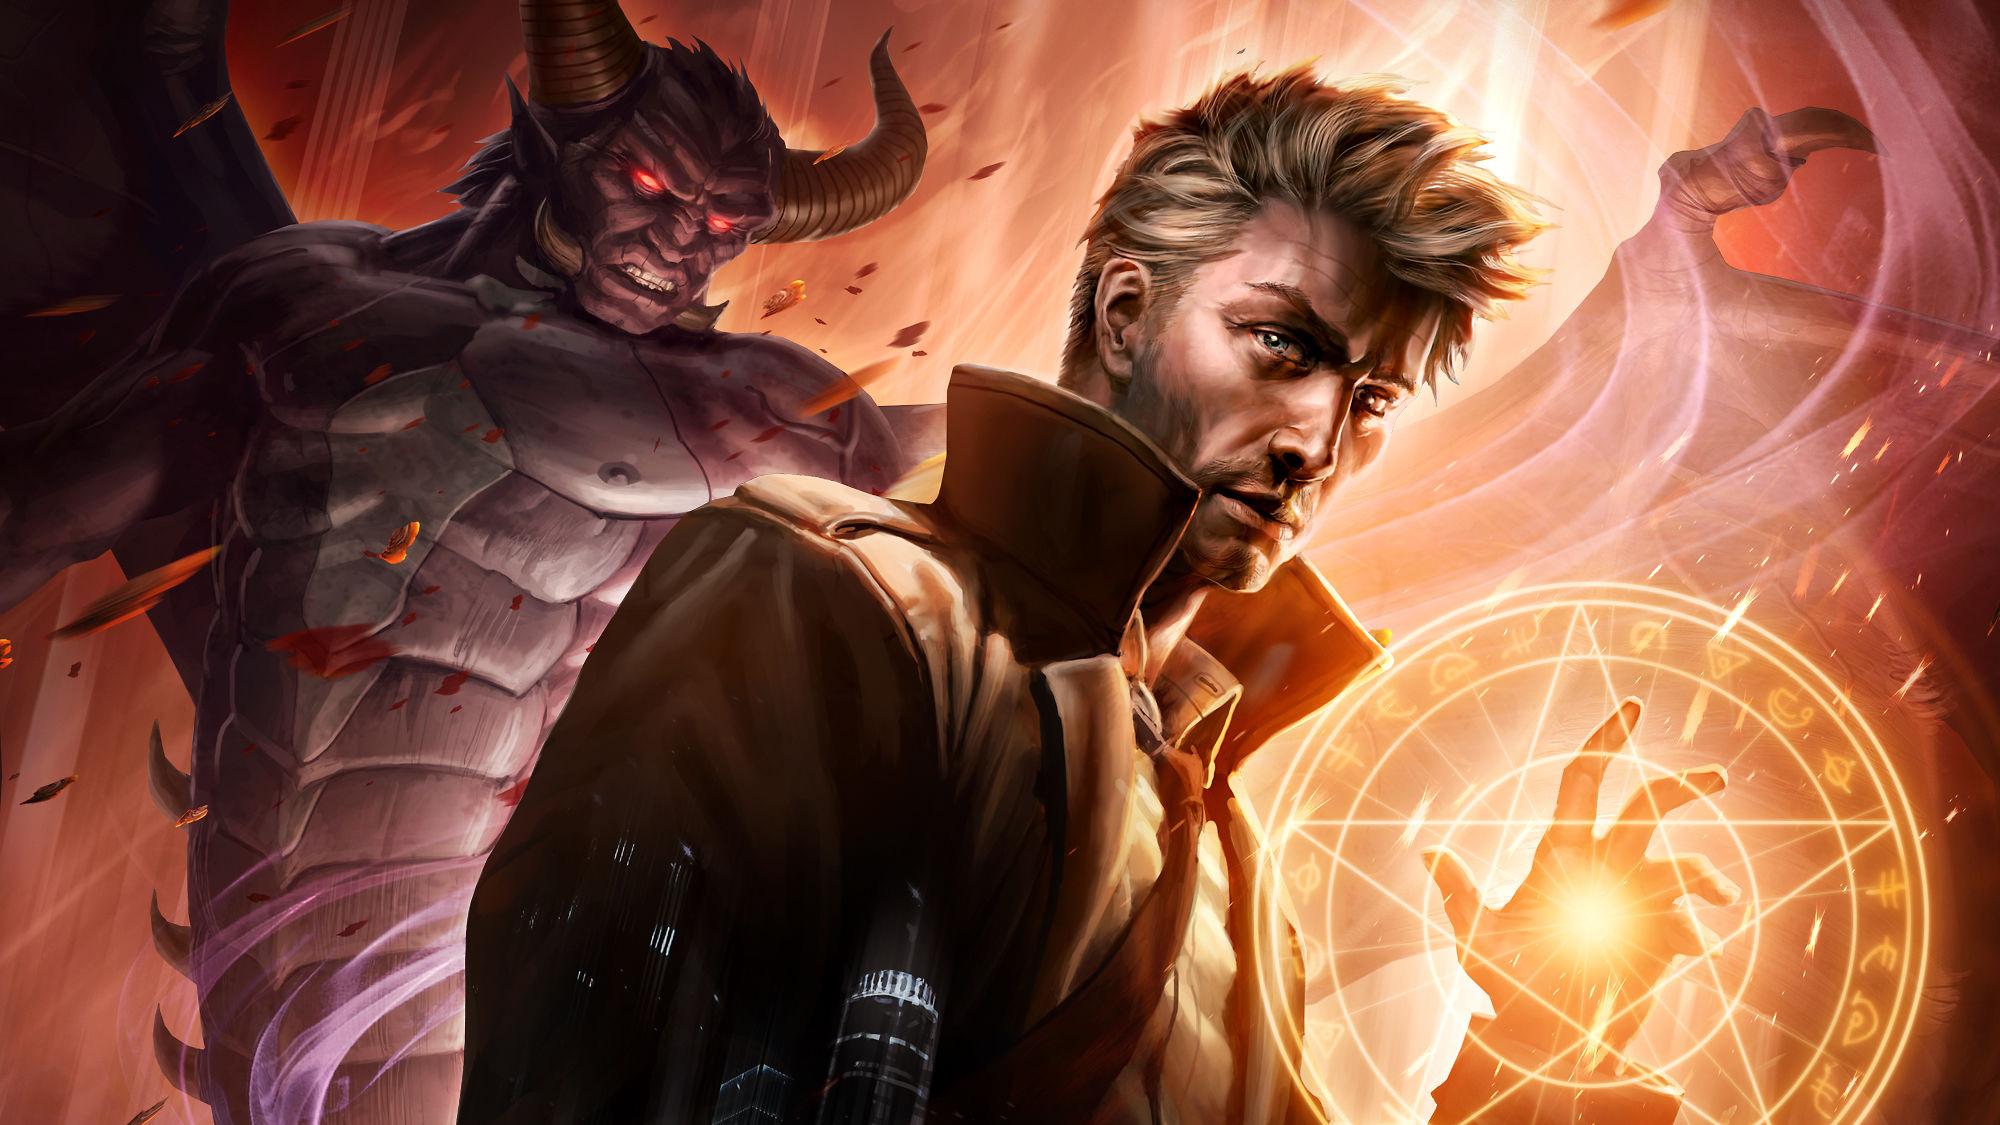 Constantine City Of Demons Hd Superheroes 4k Wallpapers